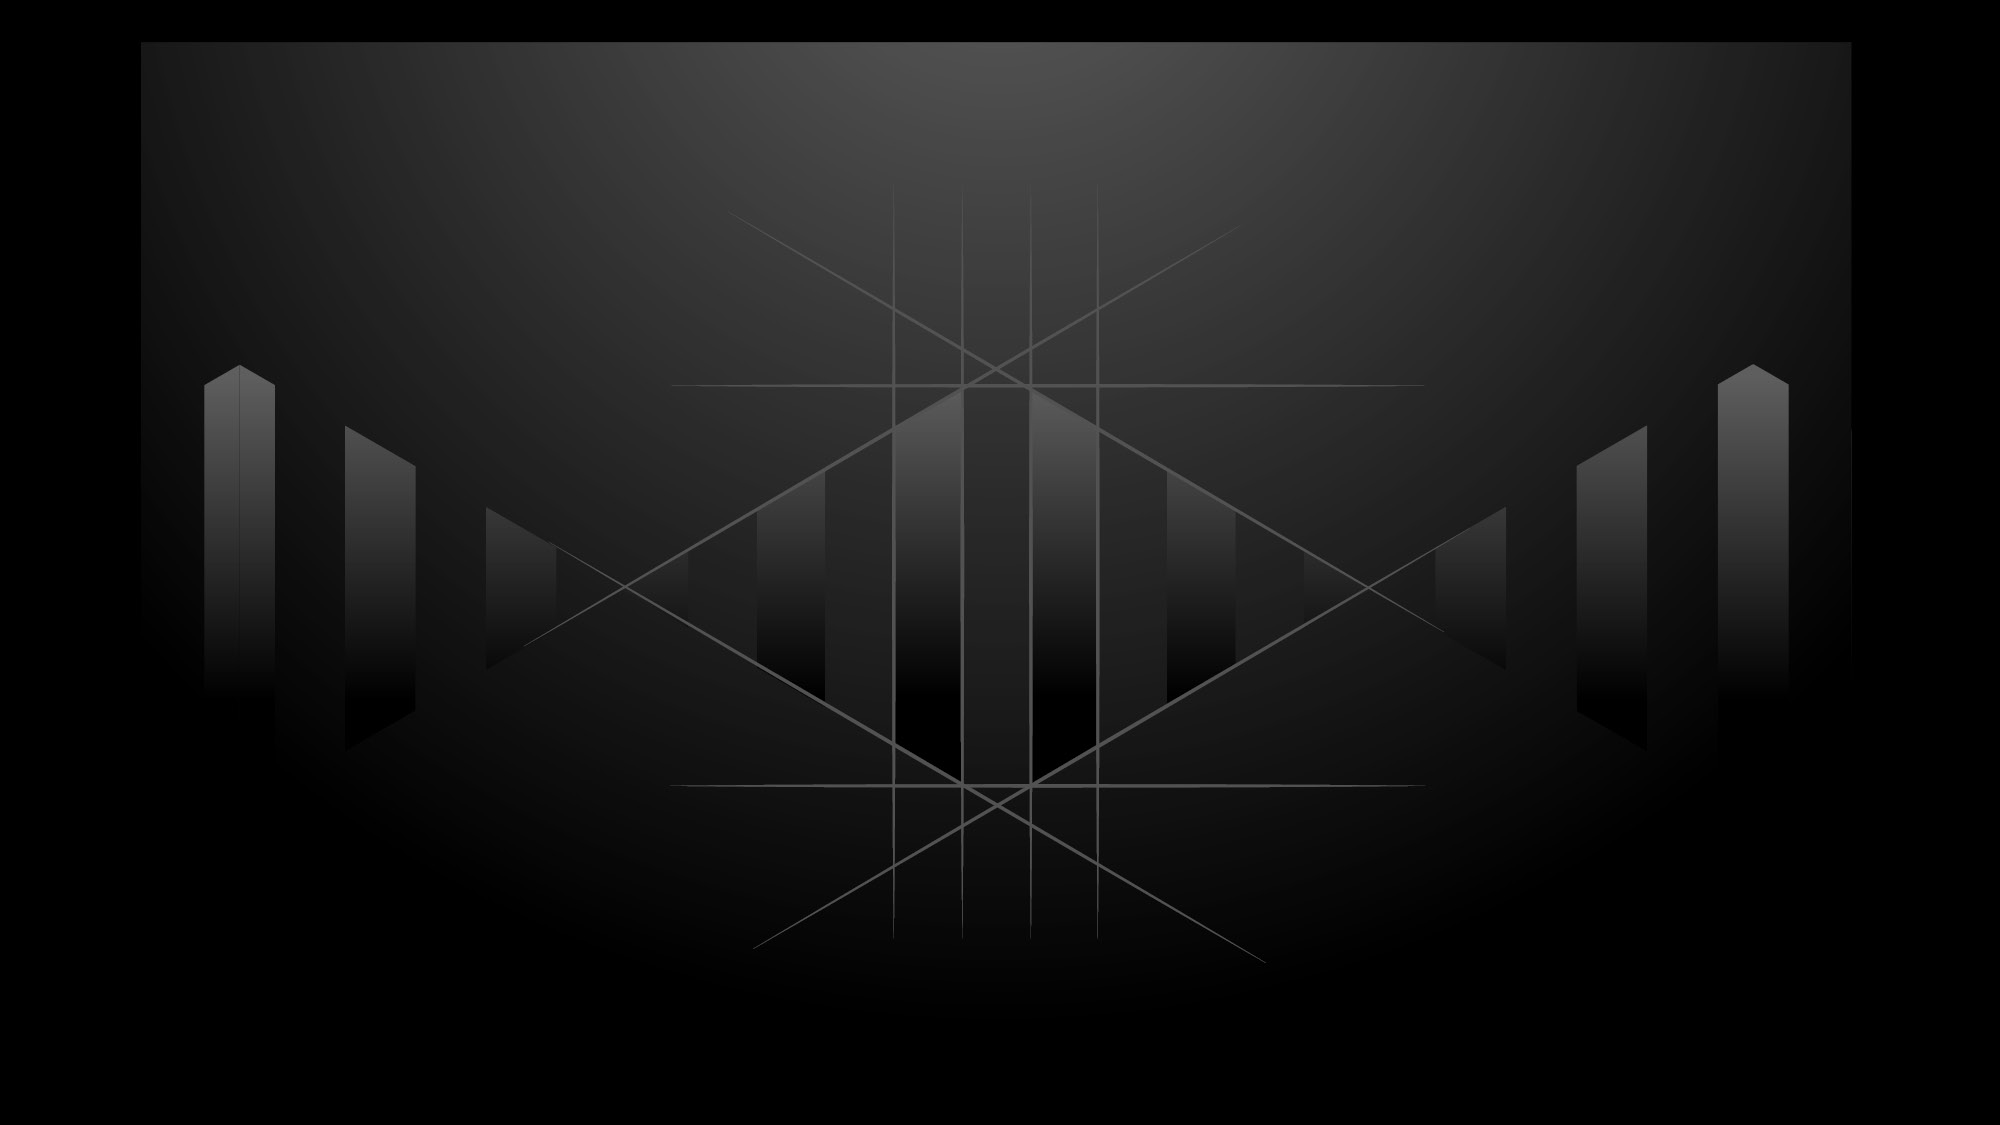 Nacione-Branding-Union-IV-Music2